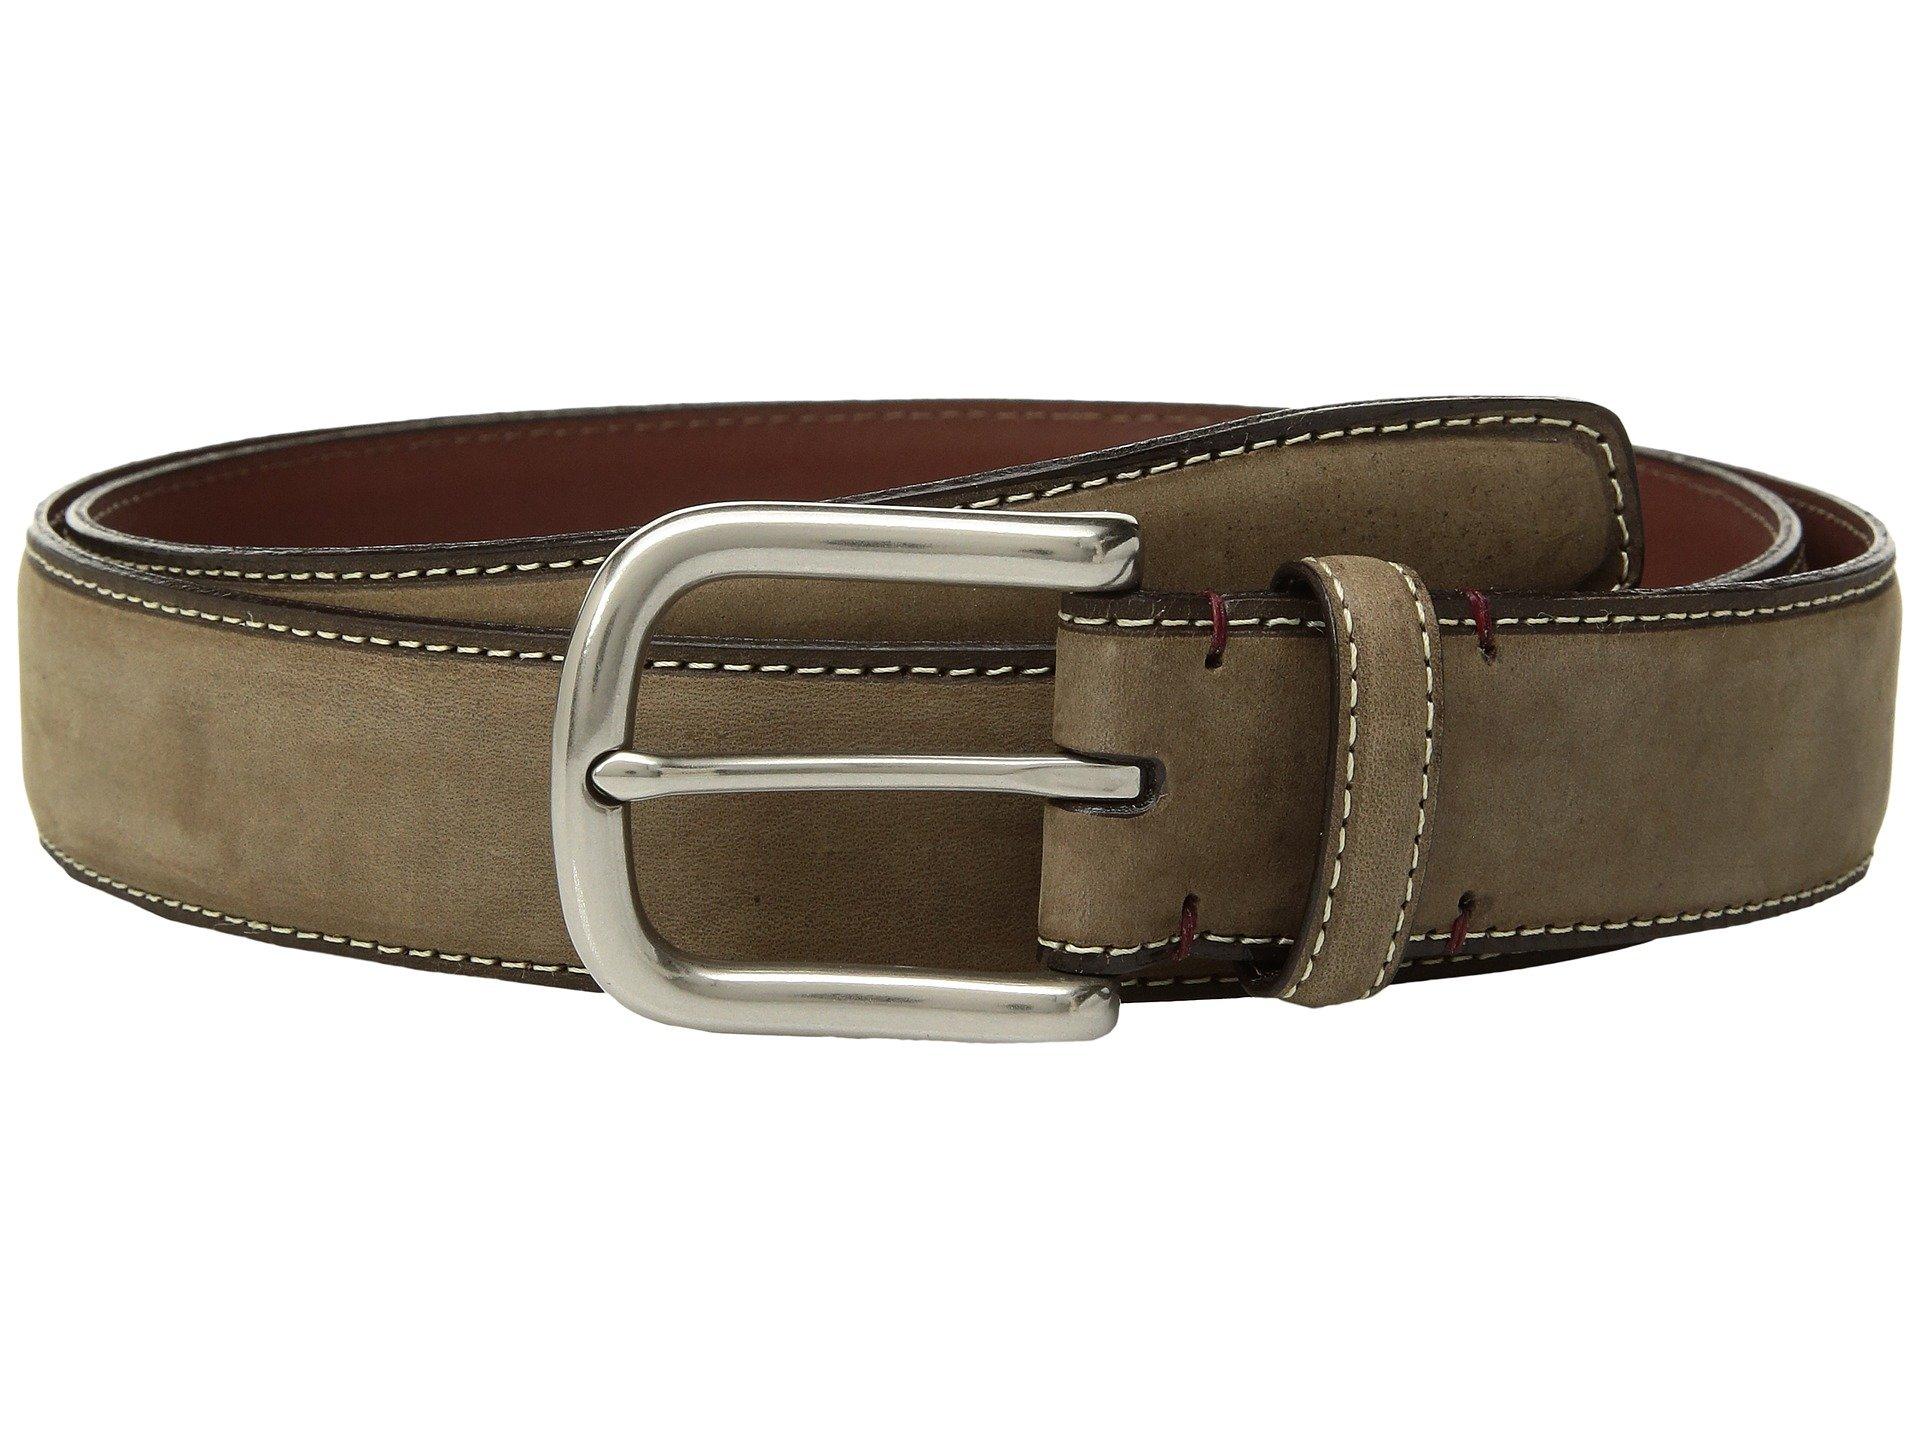 Correa o Cinturon para Hombre Torino Leather Co. 35mm Waxed Nubuck Shoulders  + Torino Leather Co. en VeoyCompro.net